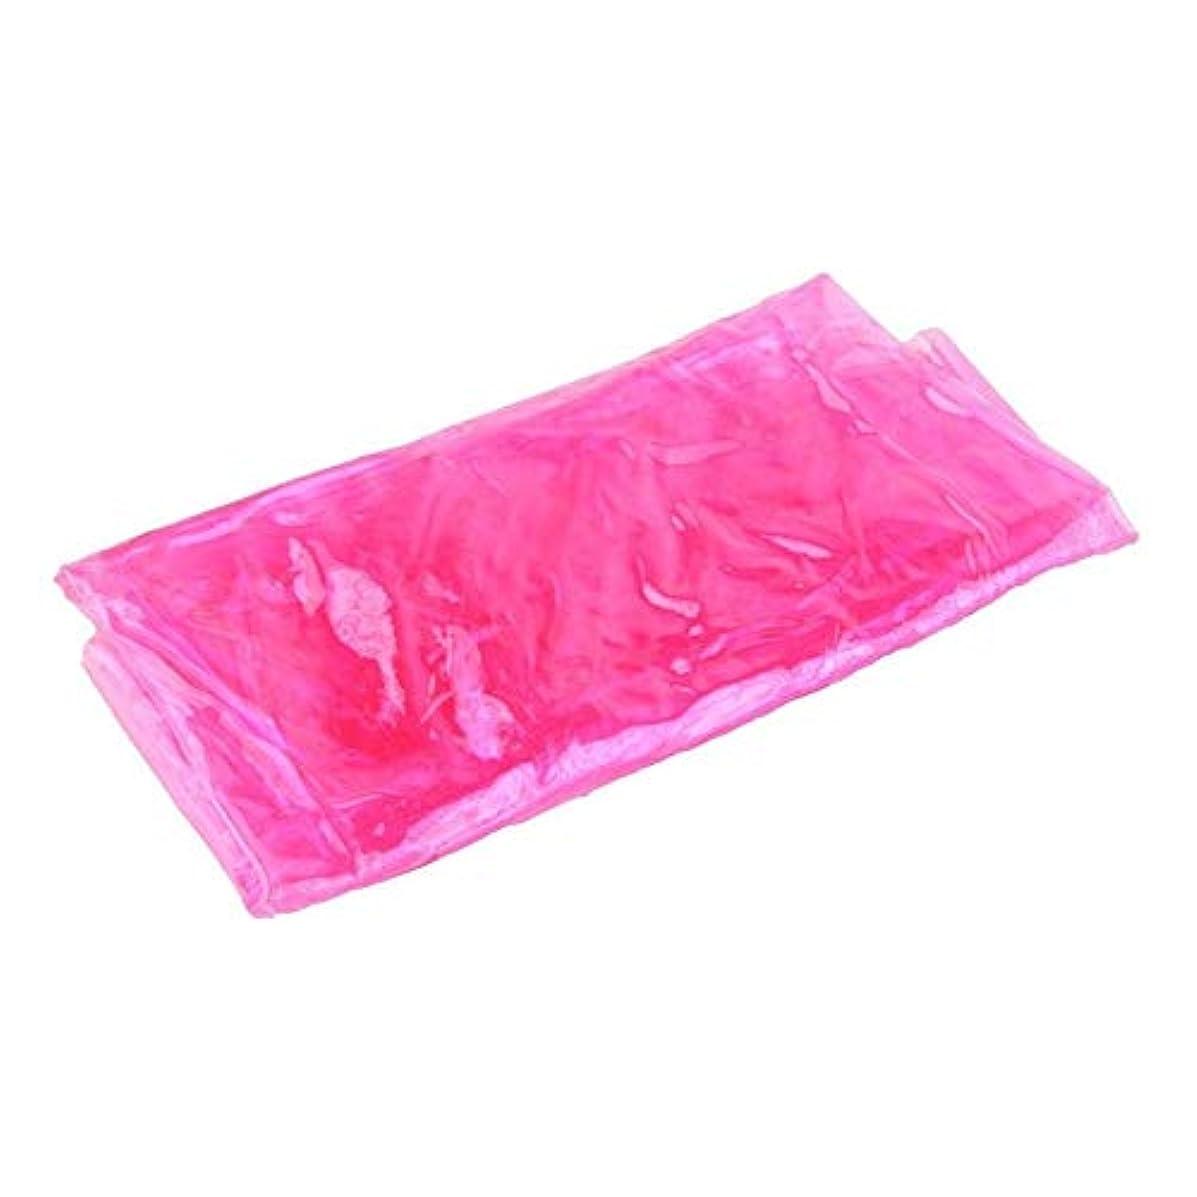 PVC Shape-Up Slimming Belt Belly Vita Body Shaper Weight Loss Sauna Belt Life To Essential Oil/Cream Massage/Spa...